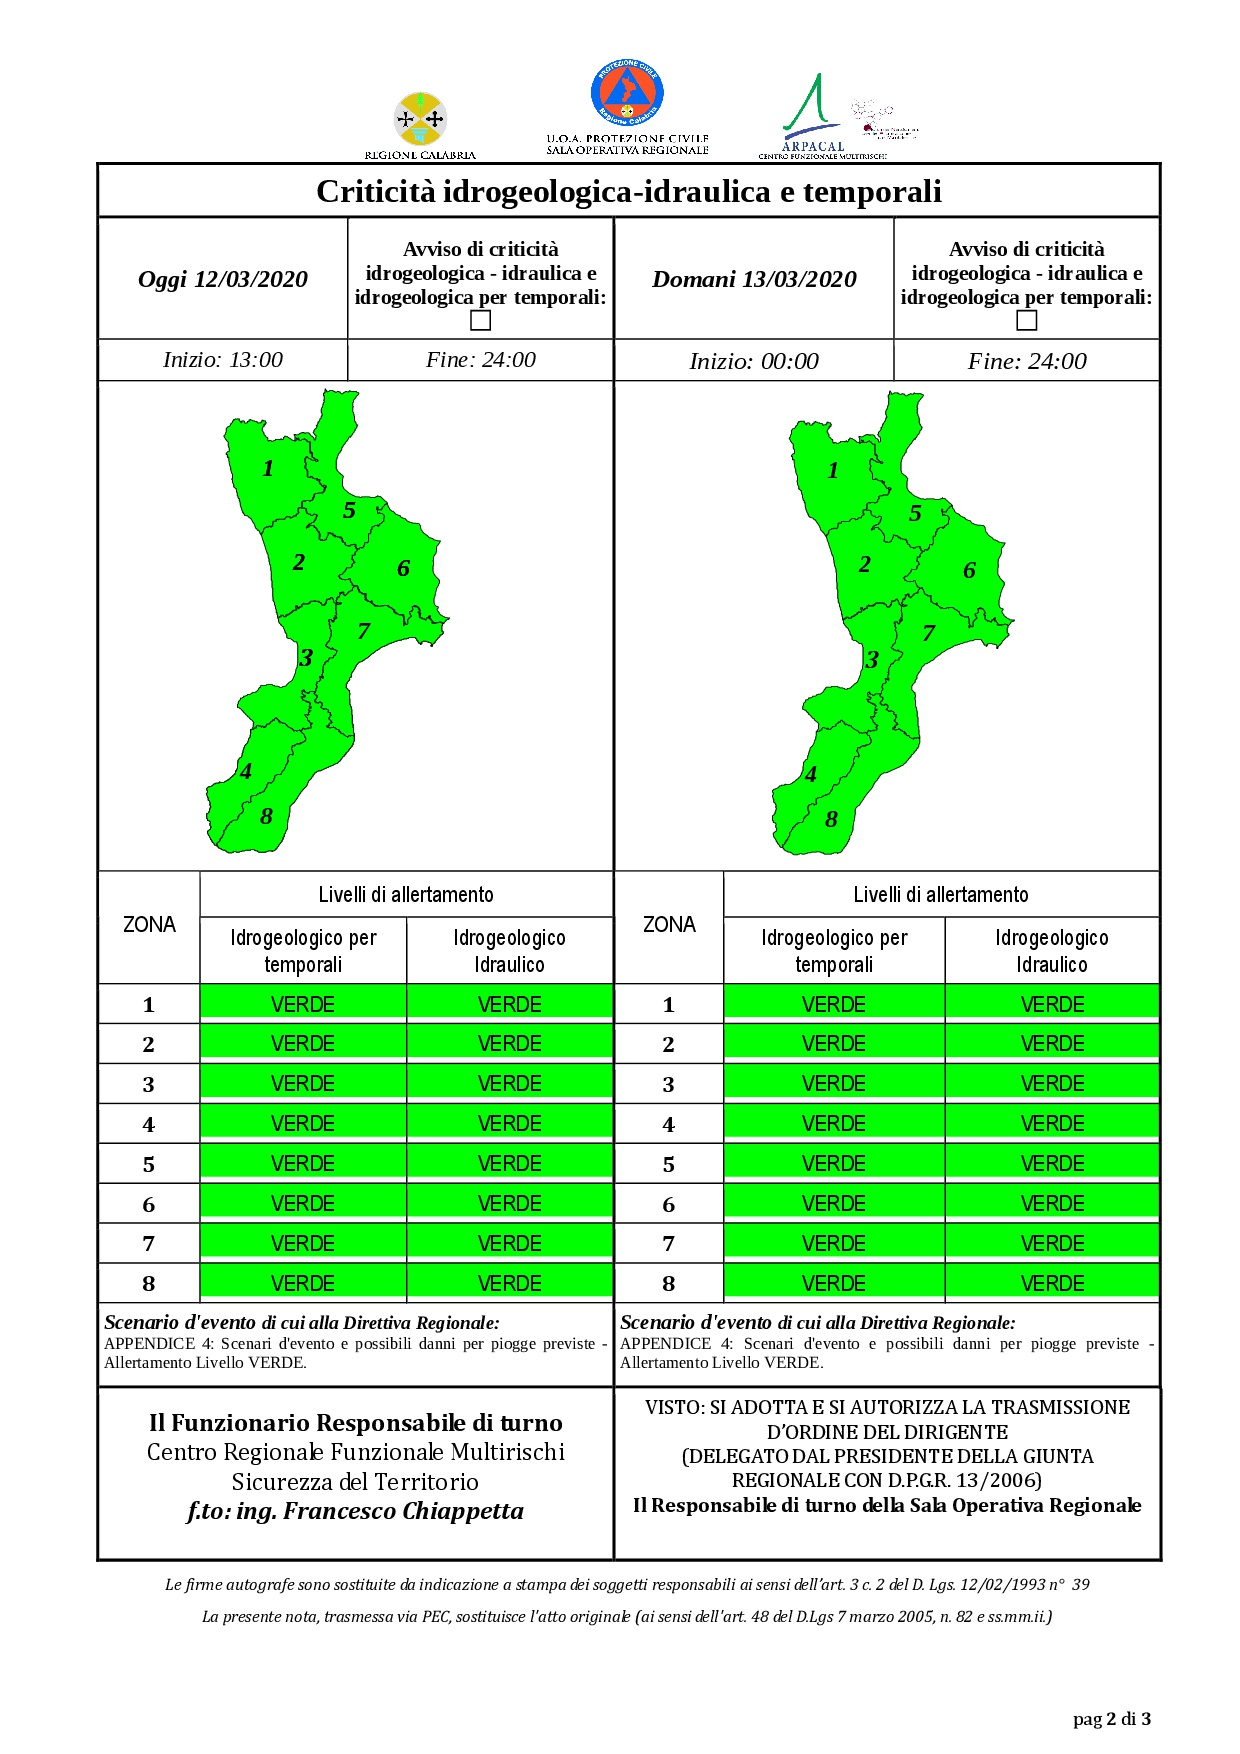 Criticità idrogeologica-idraulica e temporali in Calabria 12-03-2020